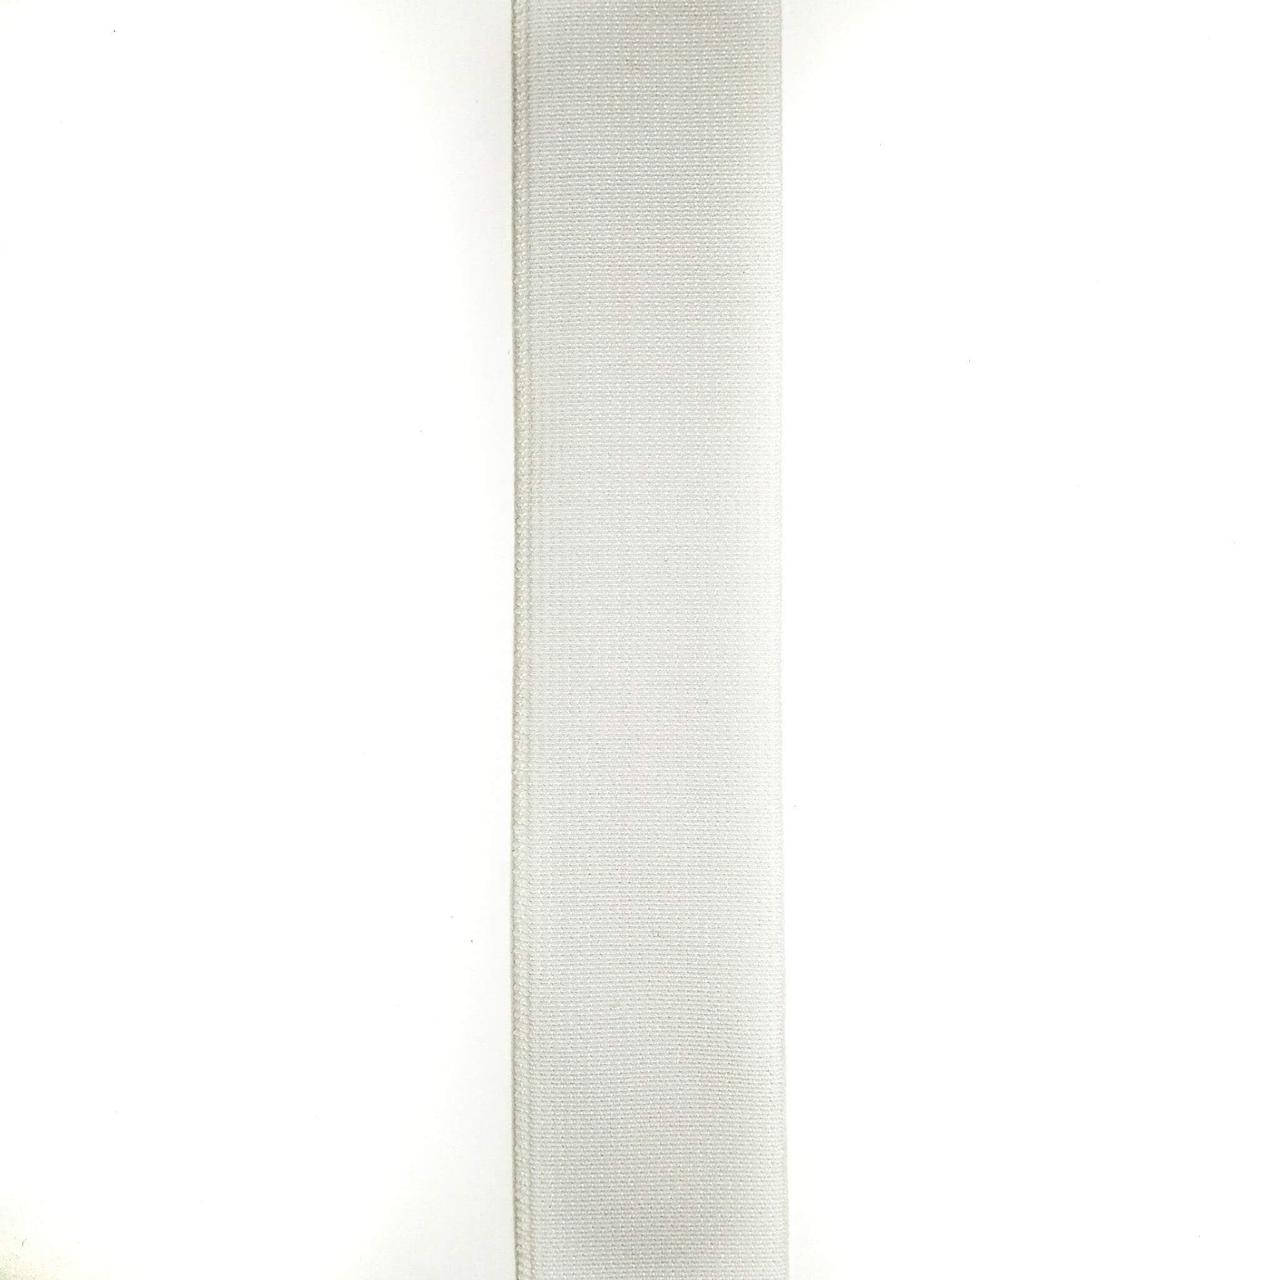 Стрічка еластична 35 мм (50м/рулон)